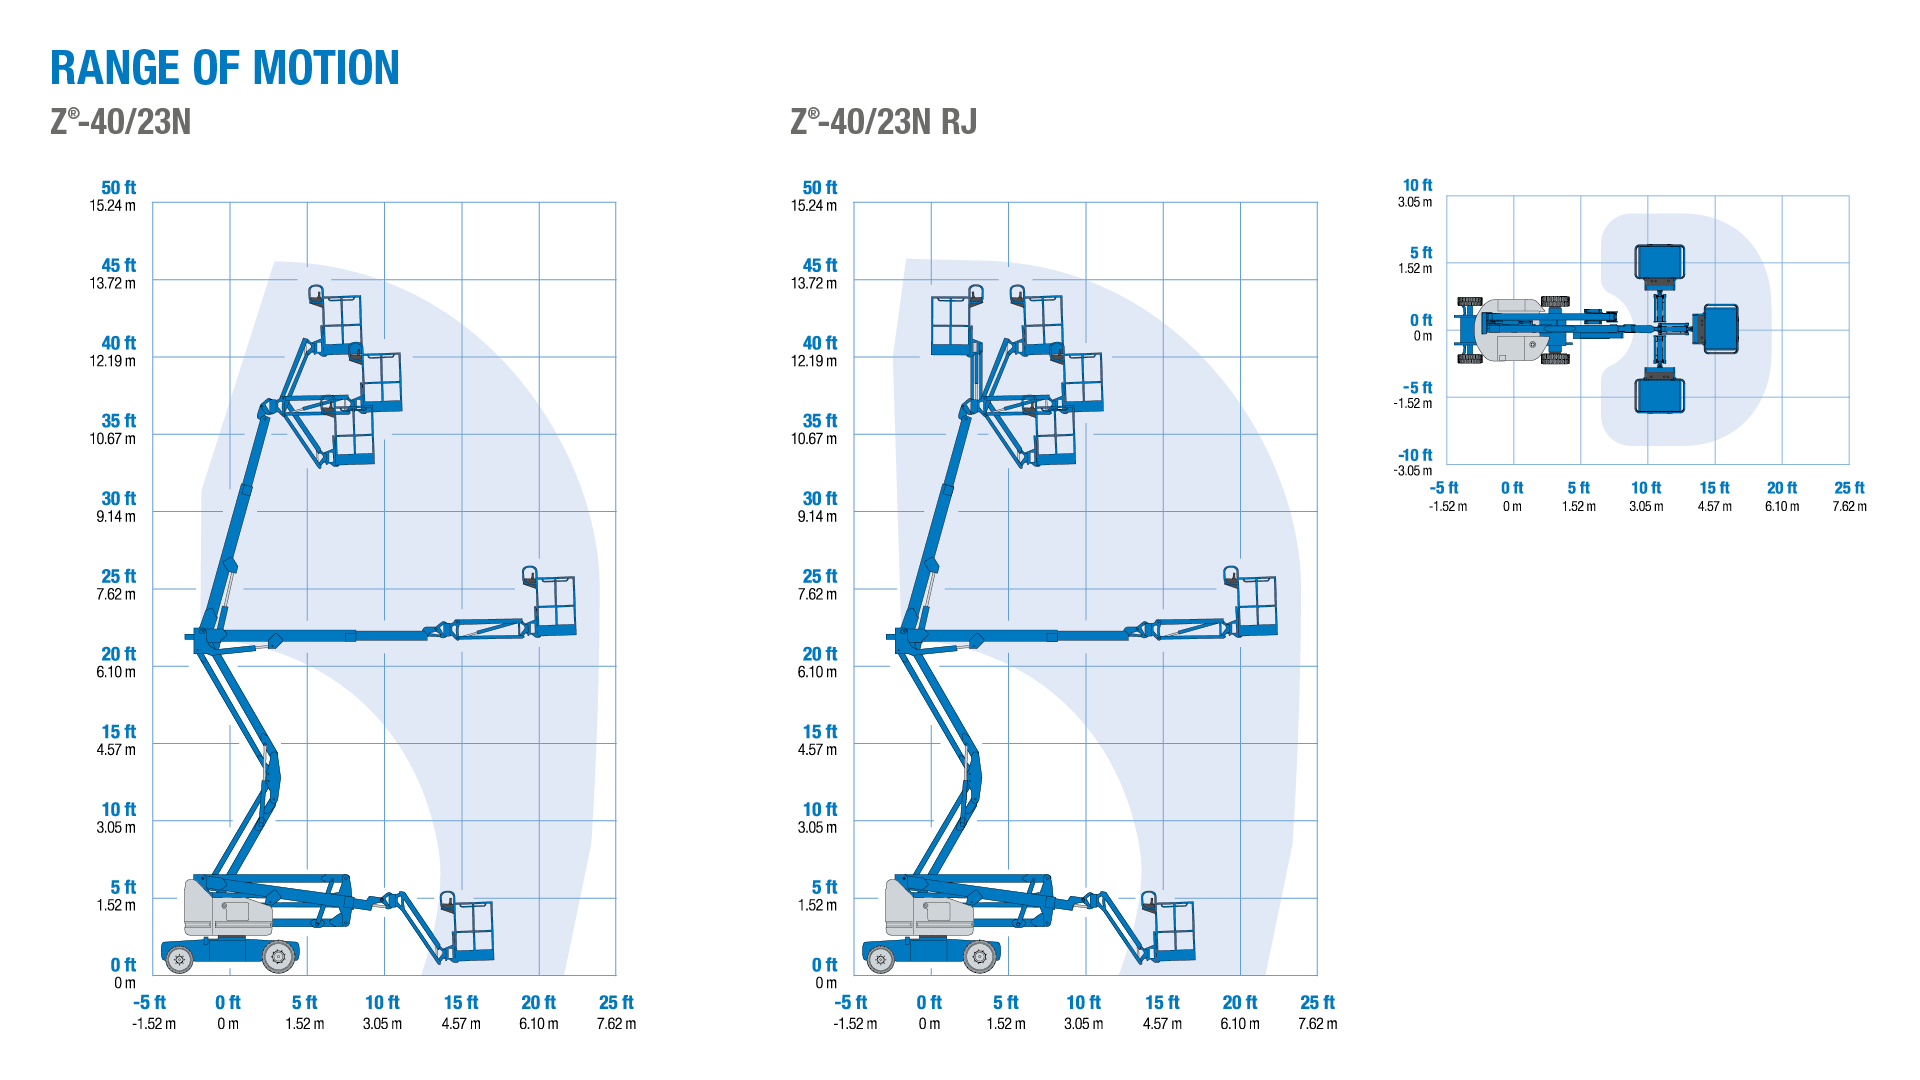 Genie Z-40/23N and Z-40/23N RJ Articulating Boom Lift